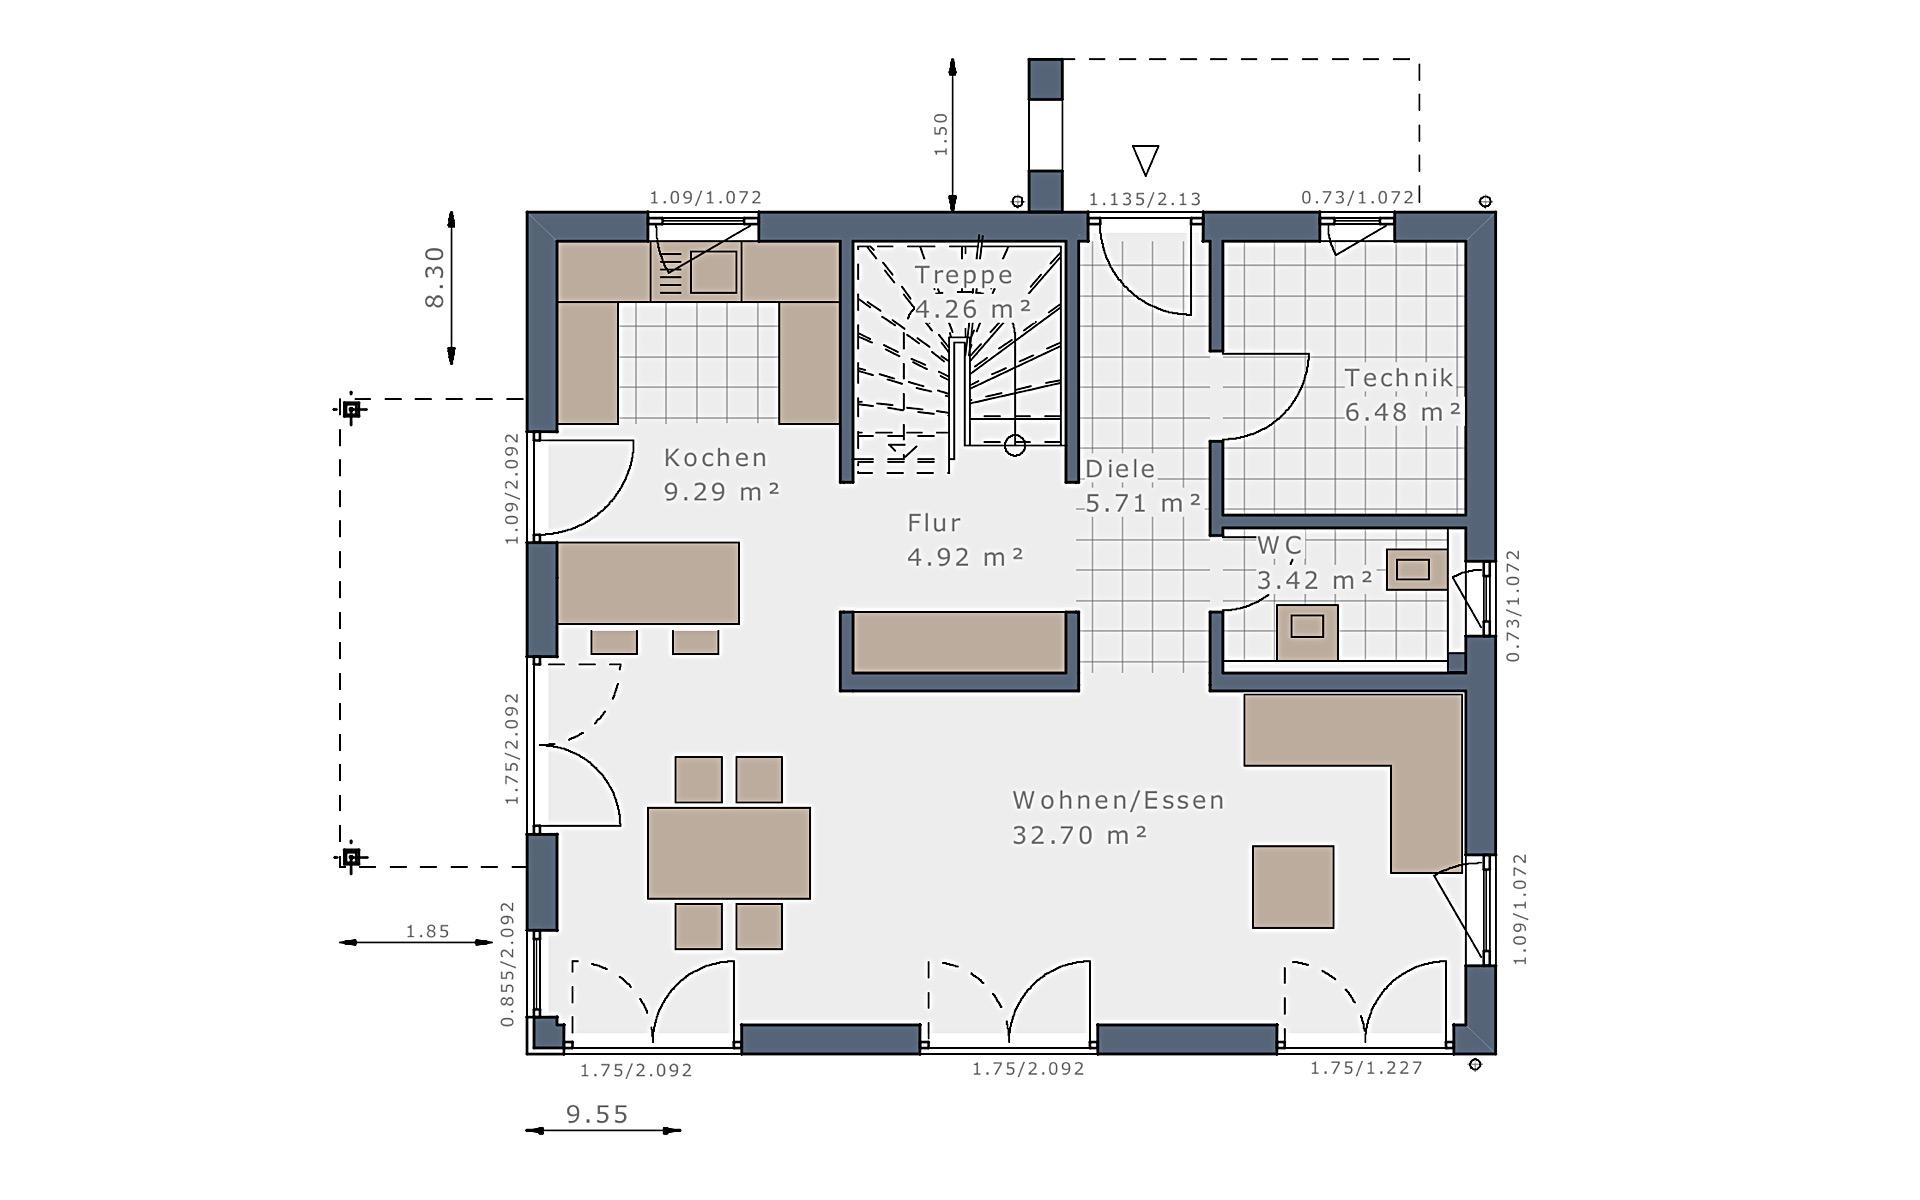 Erdgeschoss Sensation-E-132 E1 von Schwabenhaus GmbH & Co. KG